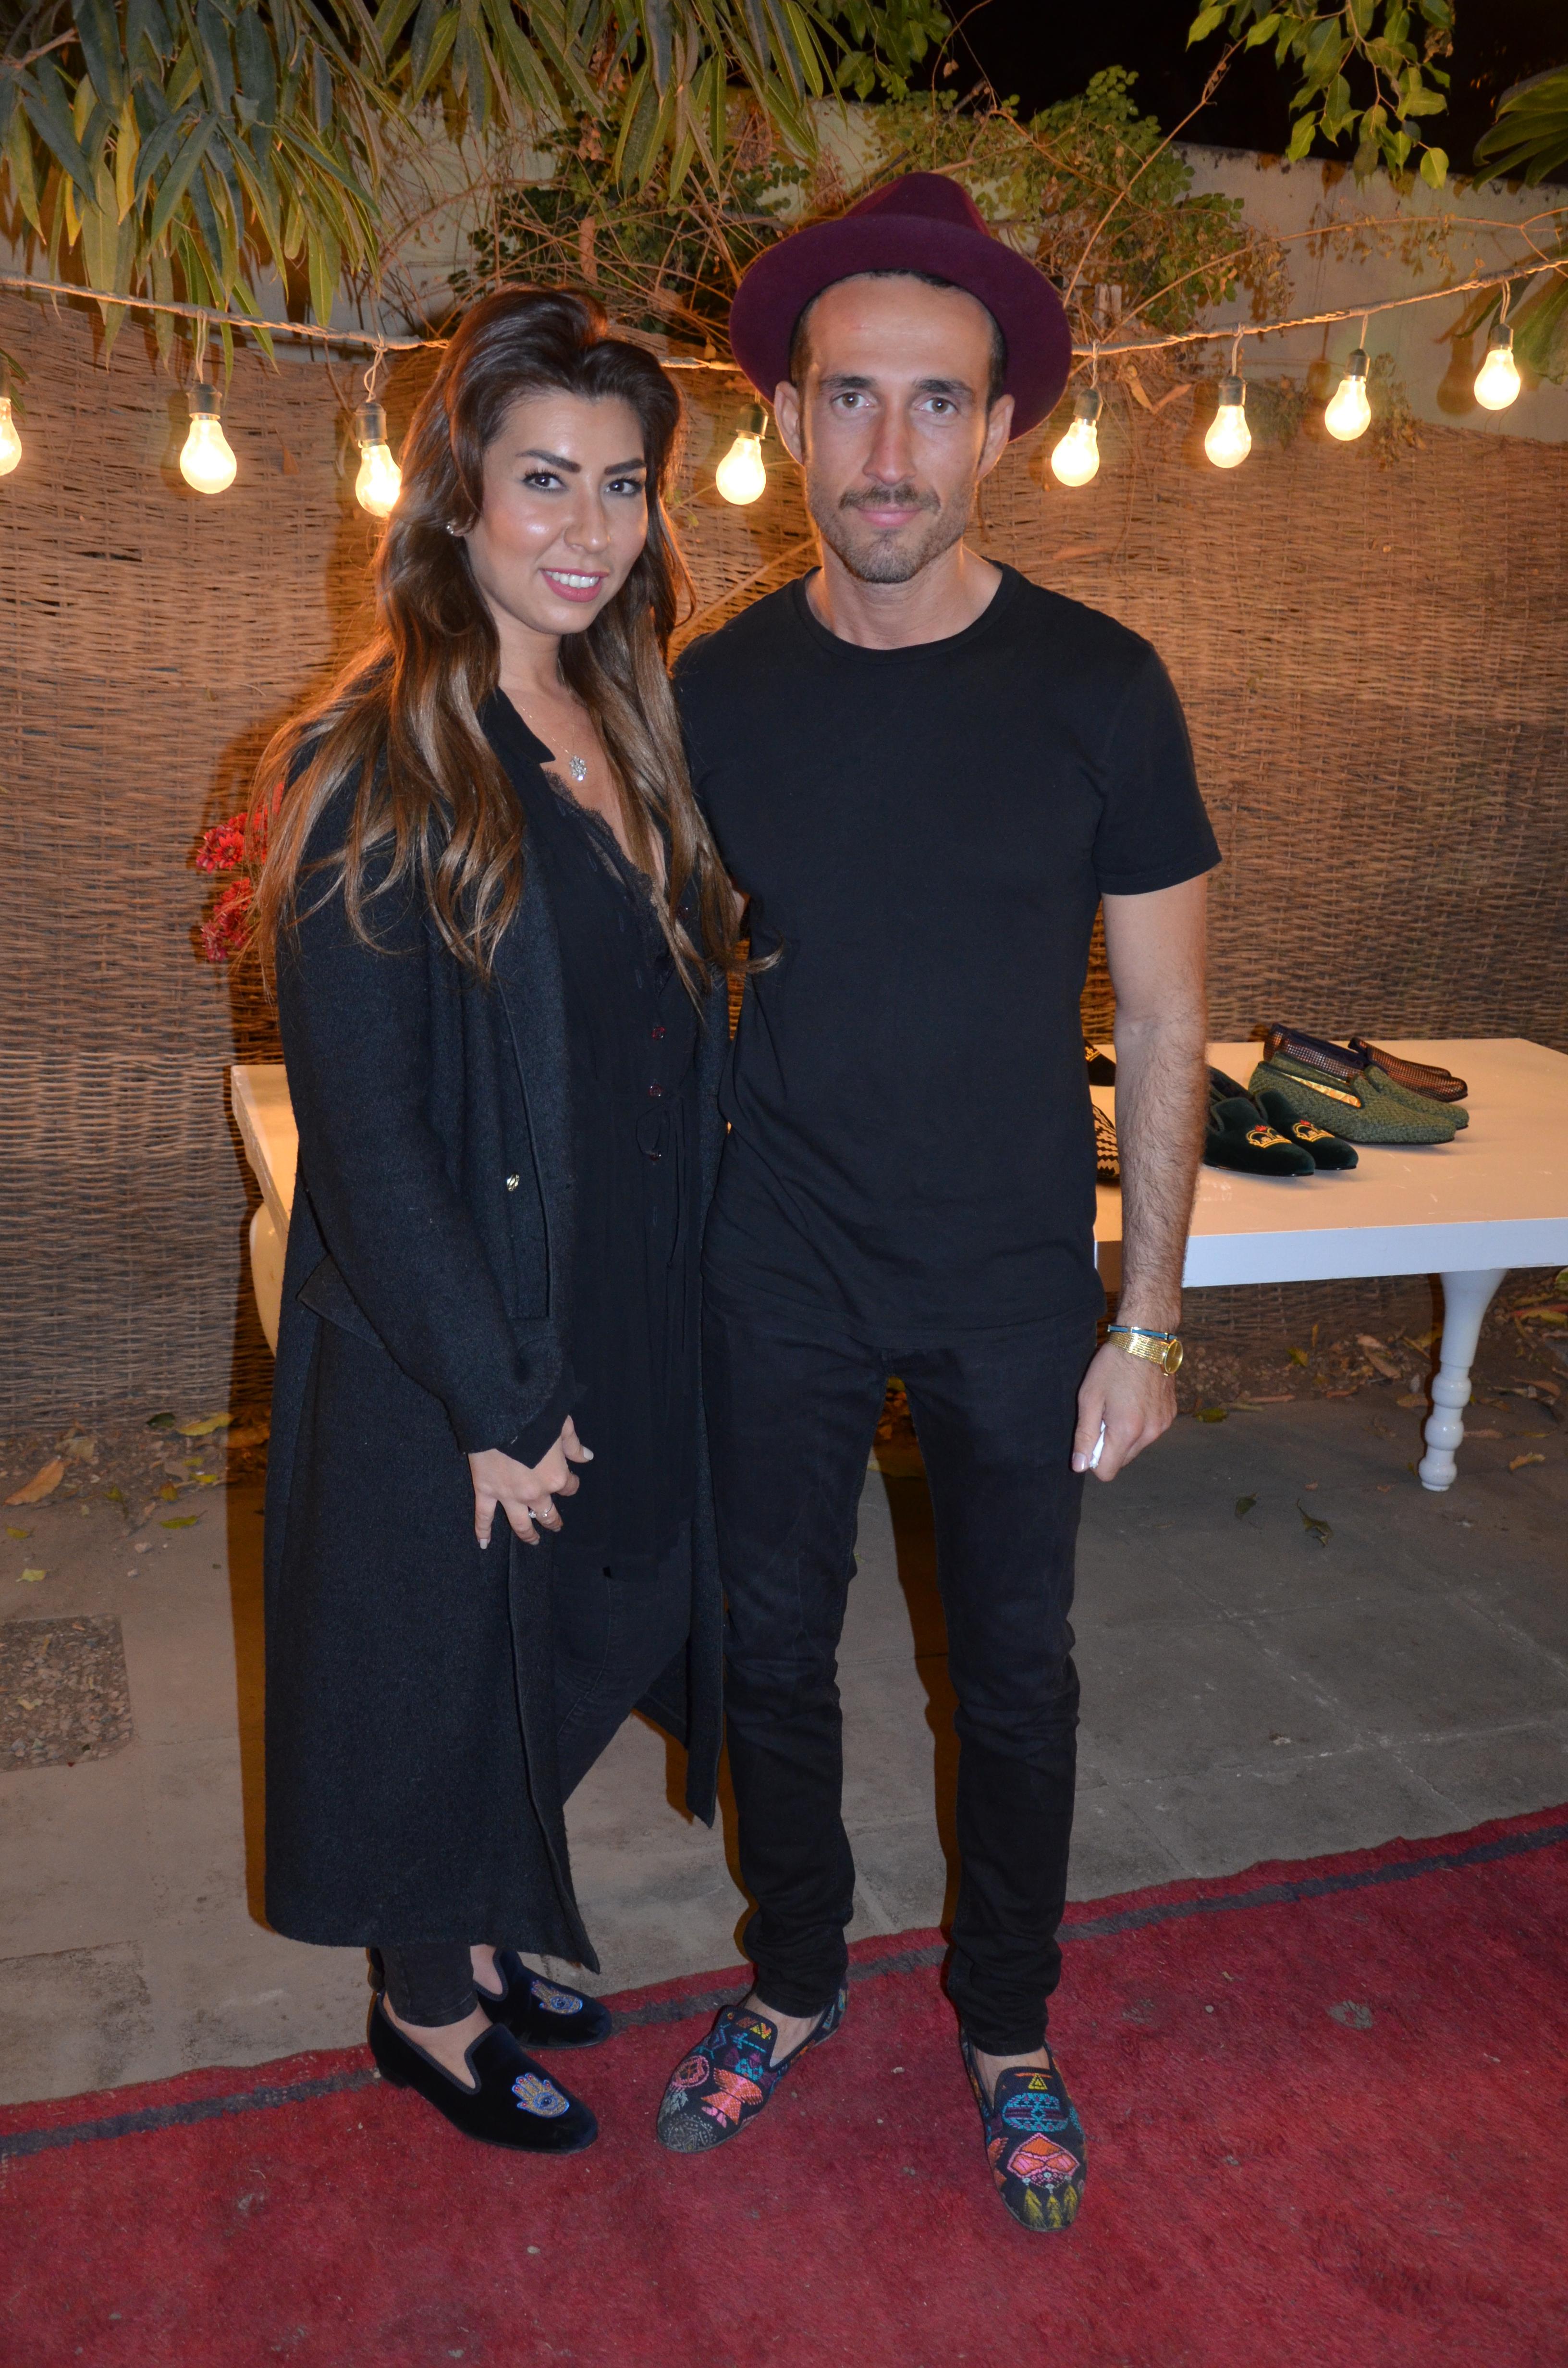 Yara El-Gendy & Khaled Makki